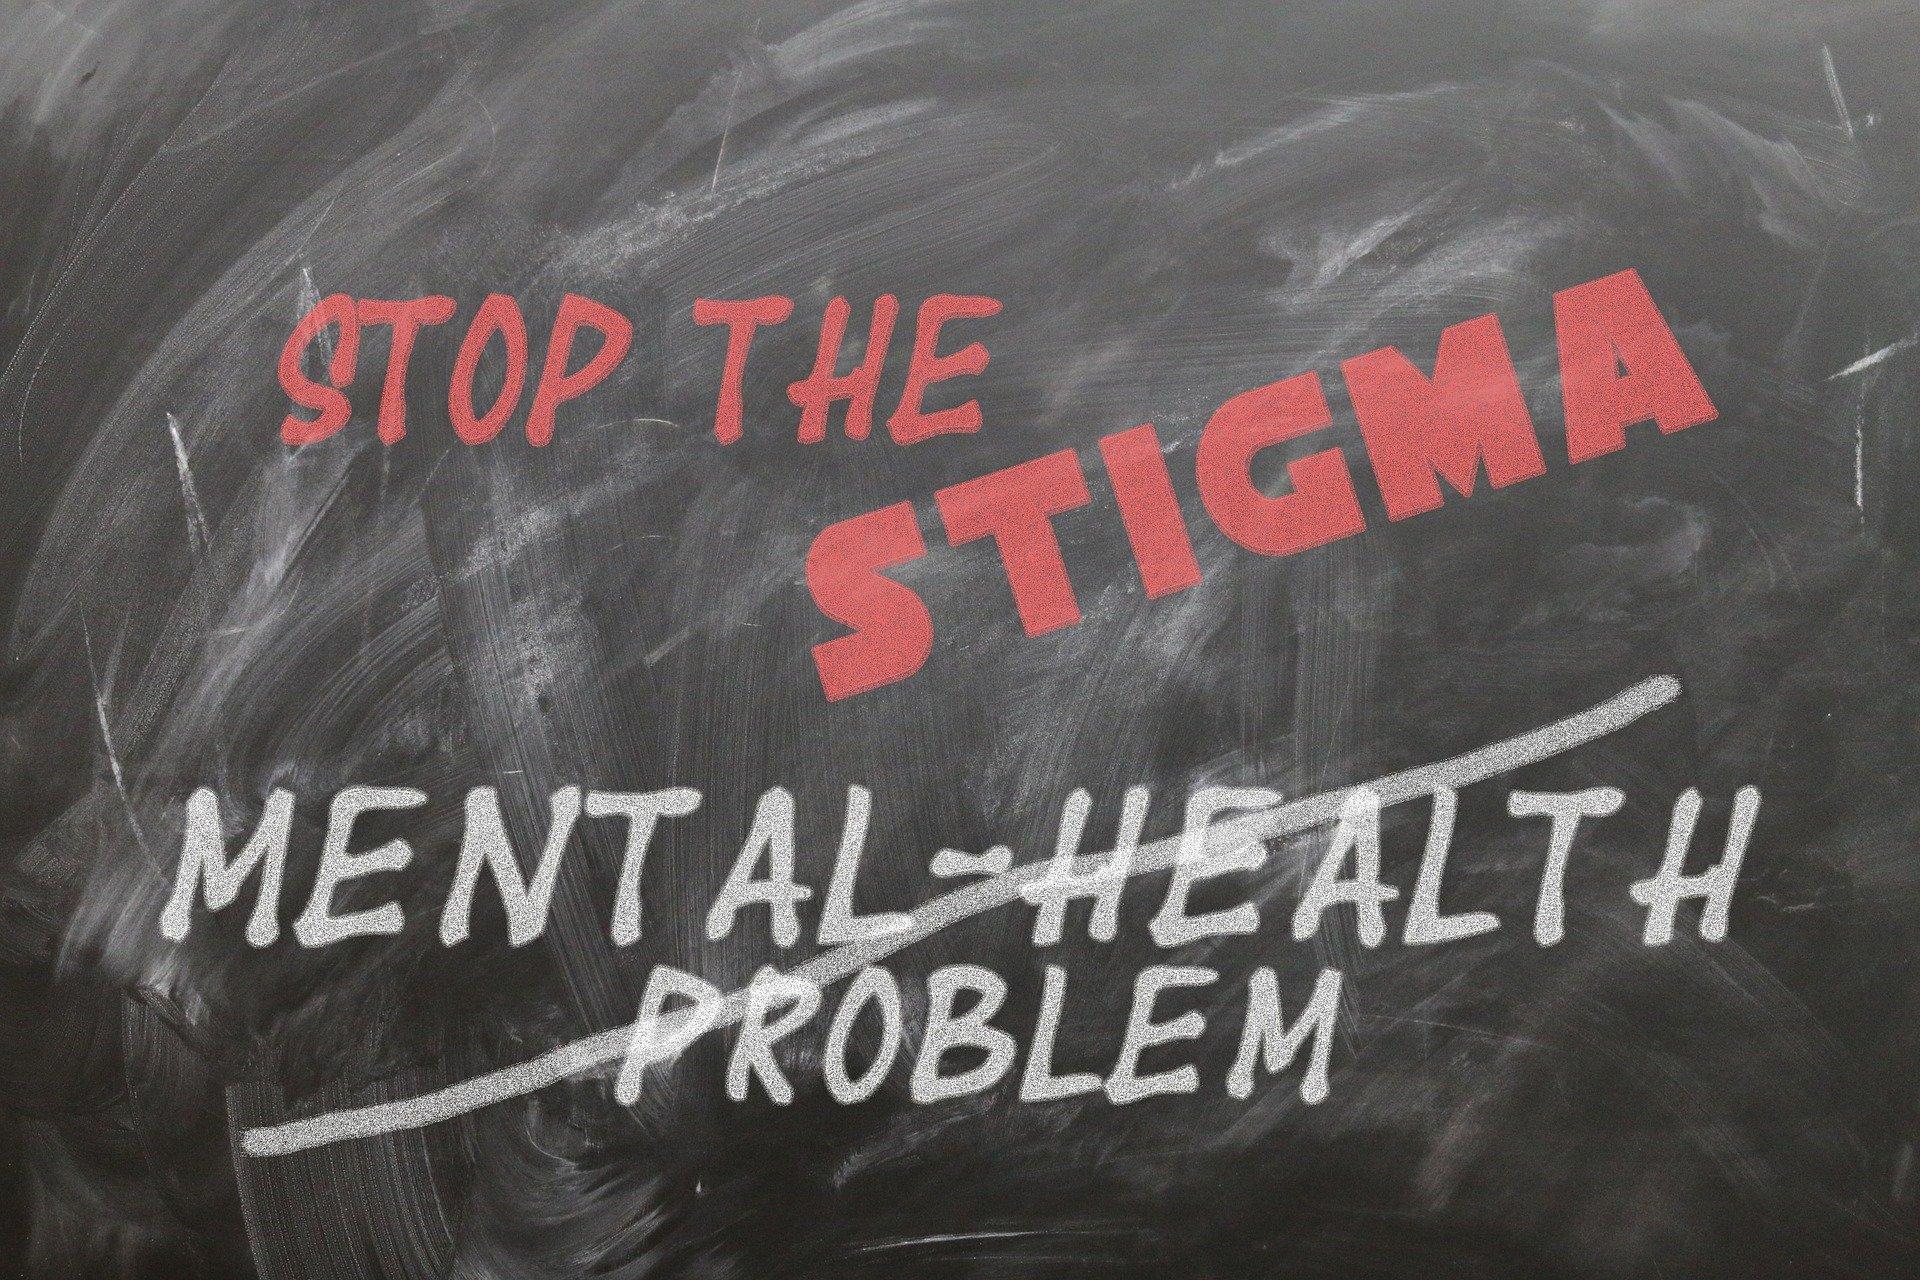 image of blackboard with stop the stigma writing